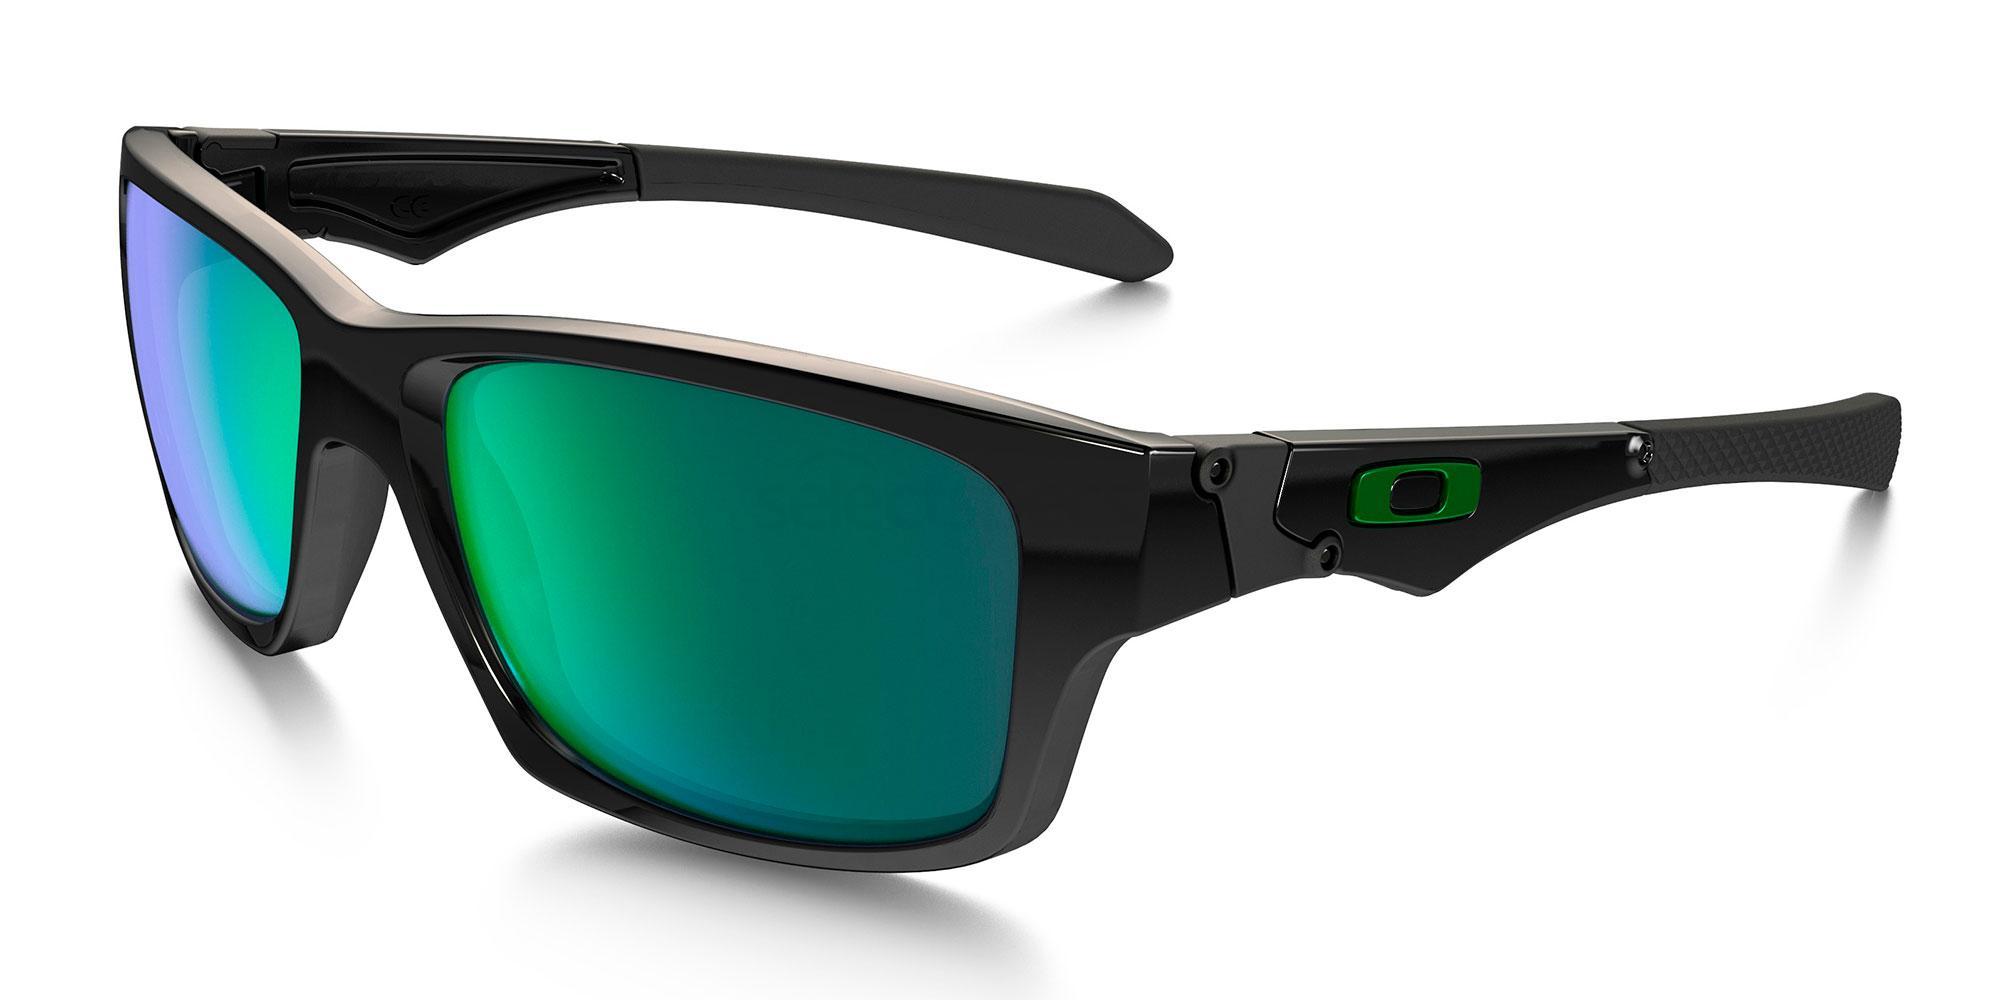 Oakley_OO9135_Jupiter_Squared_sunglasses